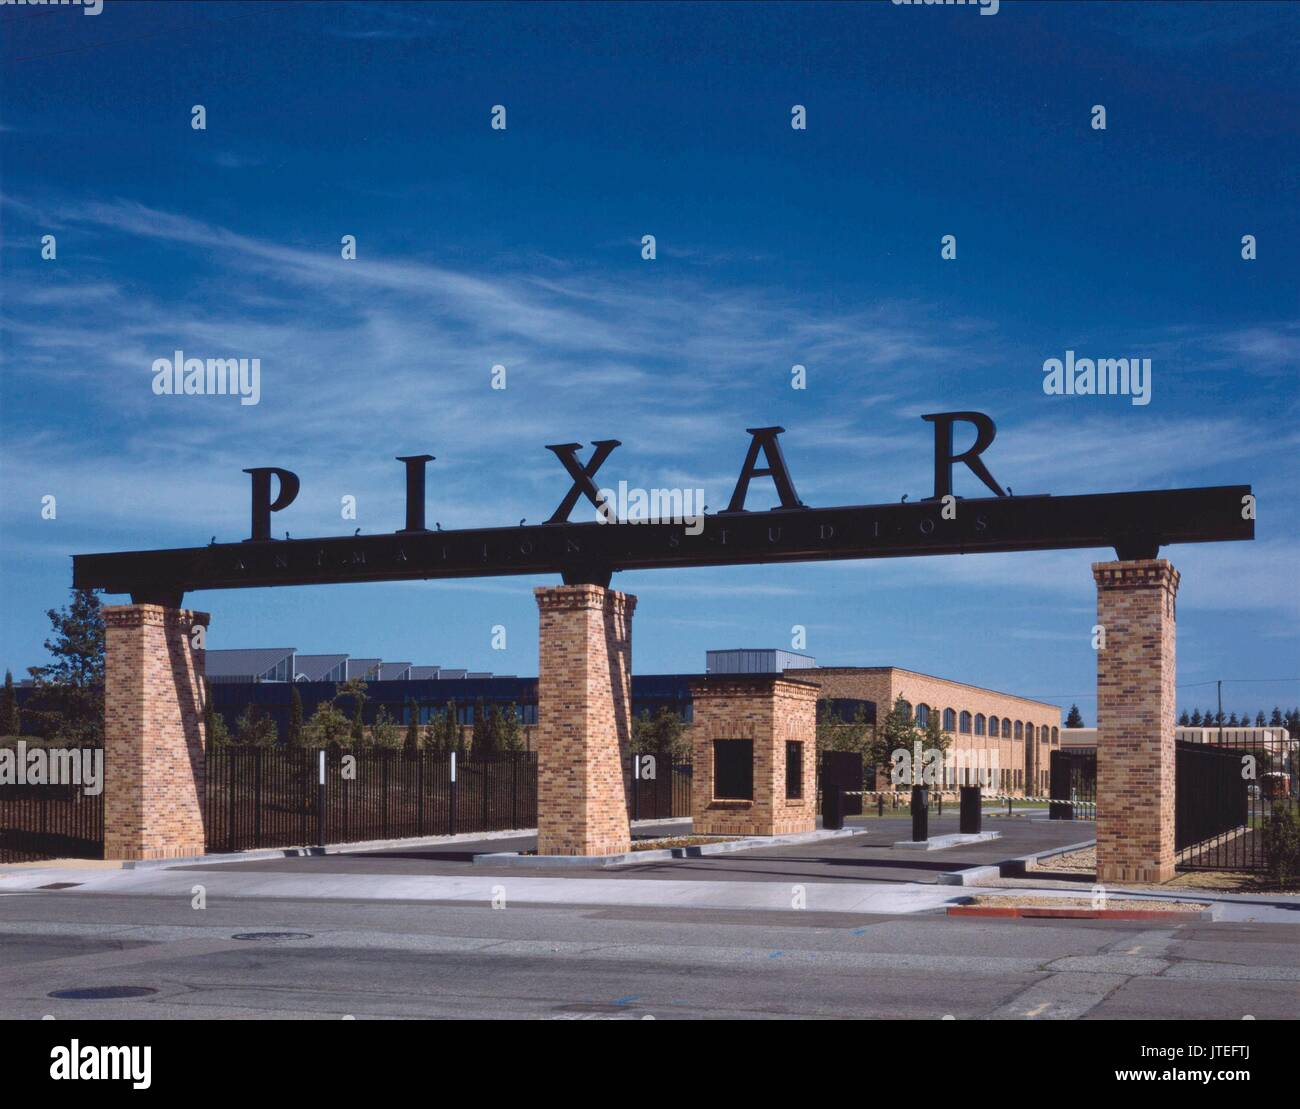 PIXAR ANIMATION STUDIOS FINDING NEMO (2003) - Stock Image